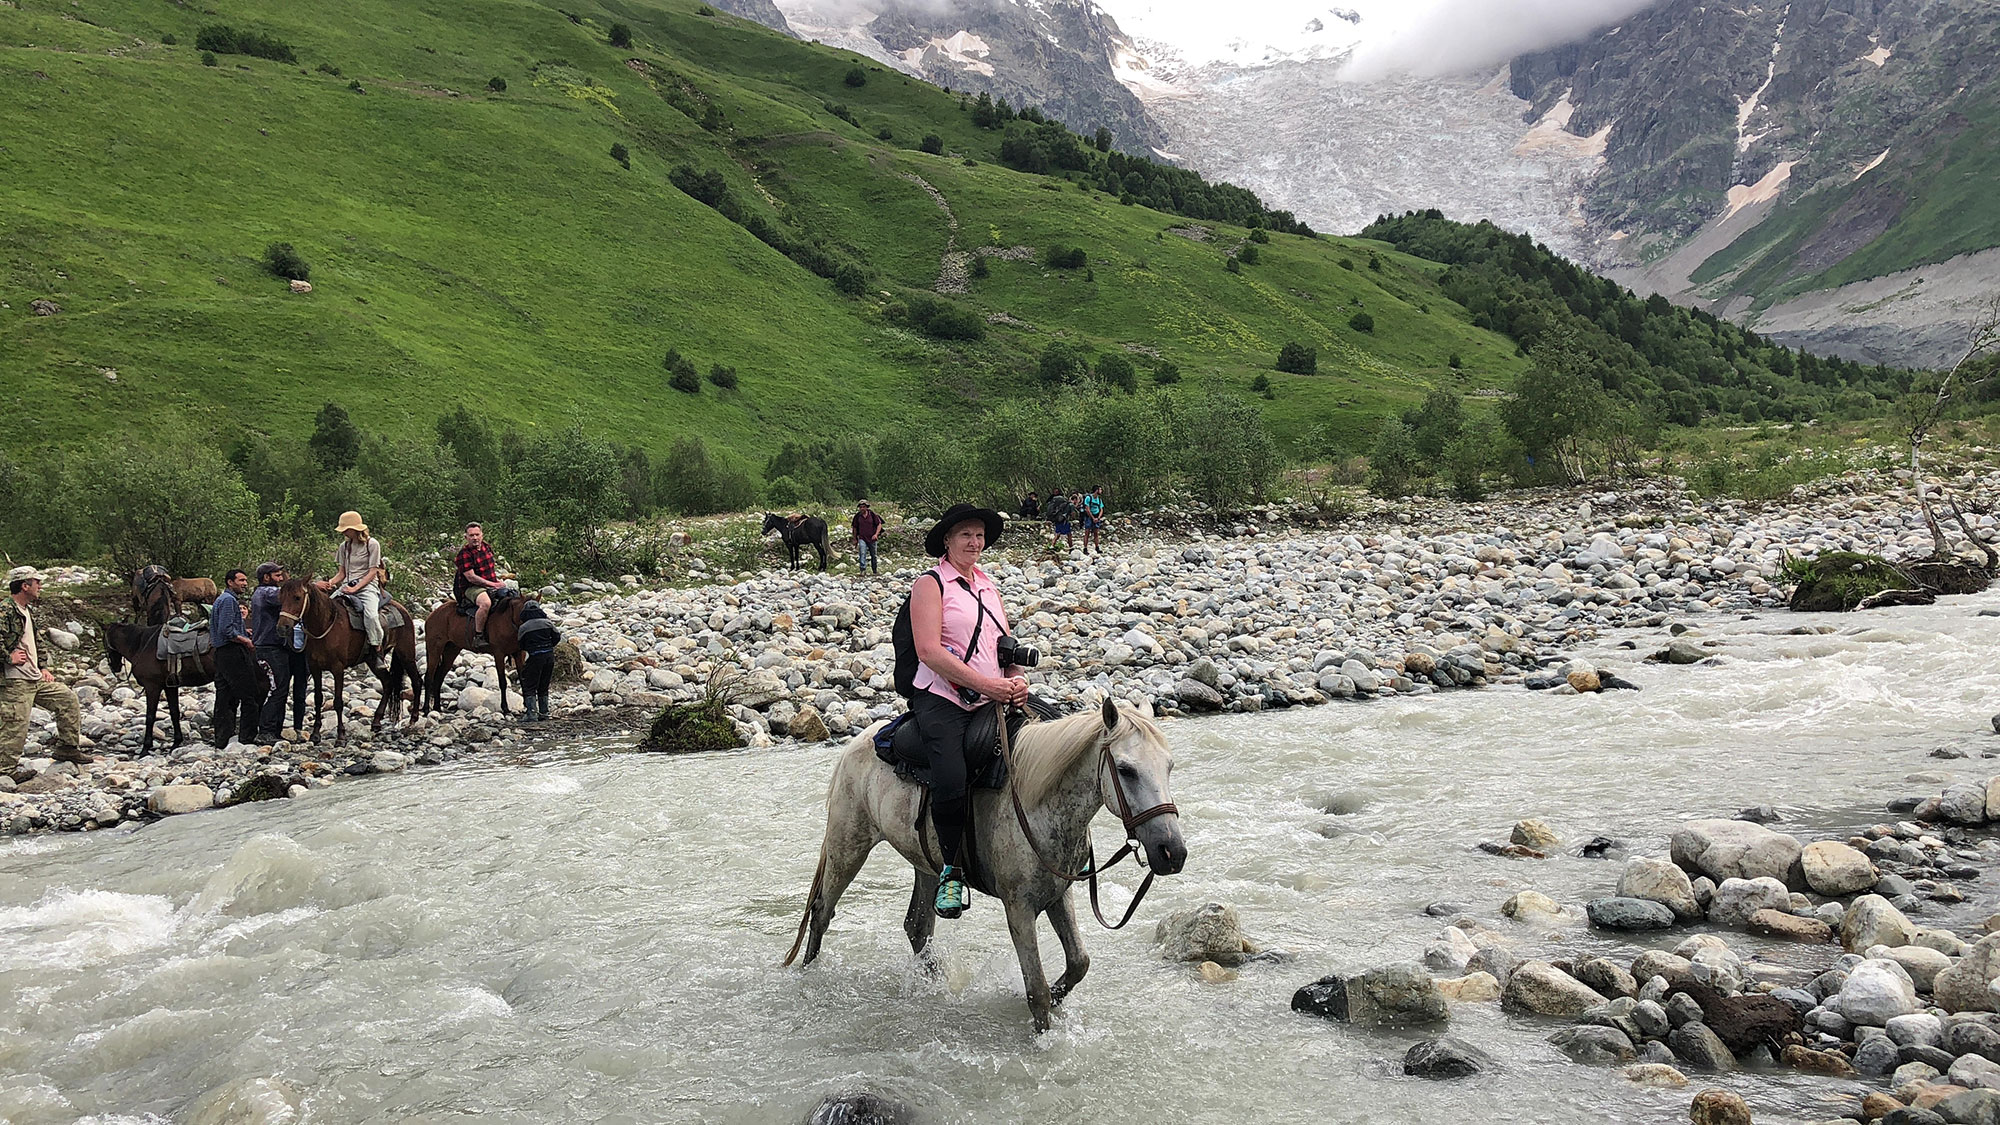 Chkhutnieri Pass